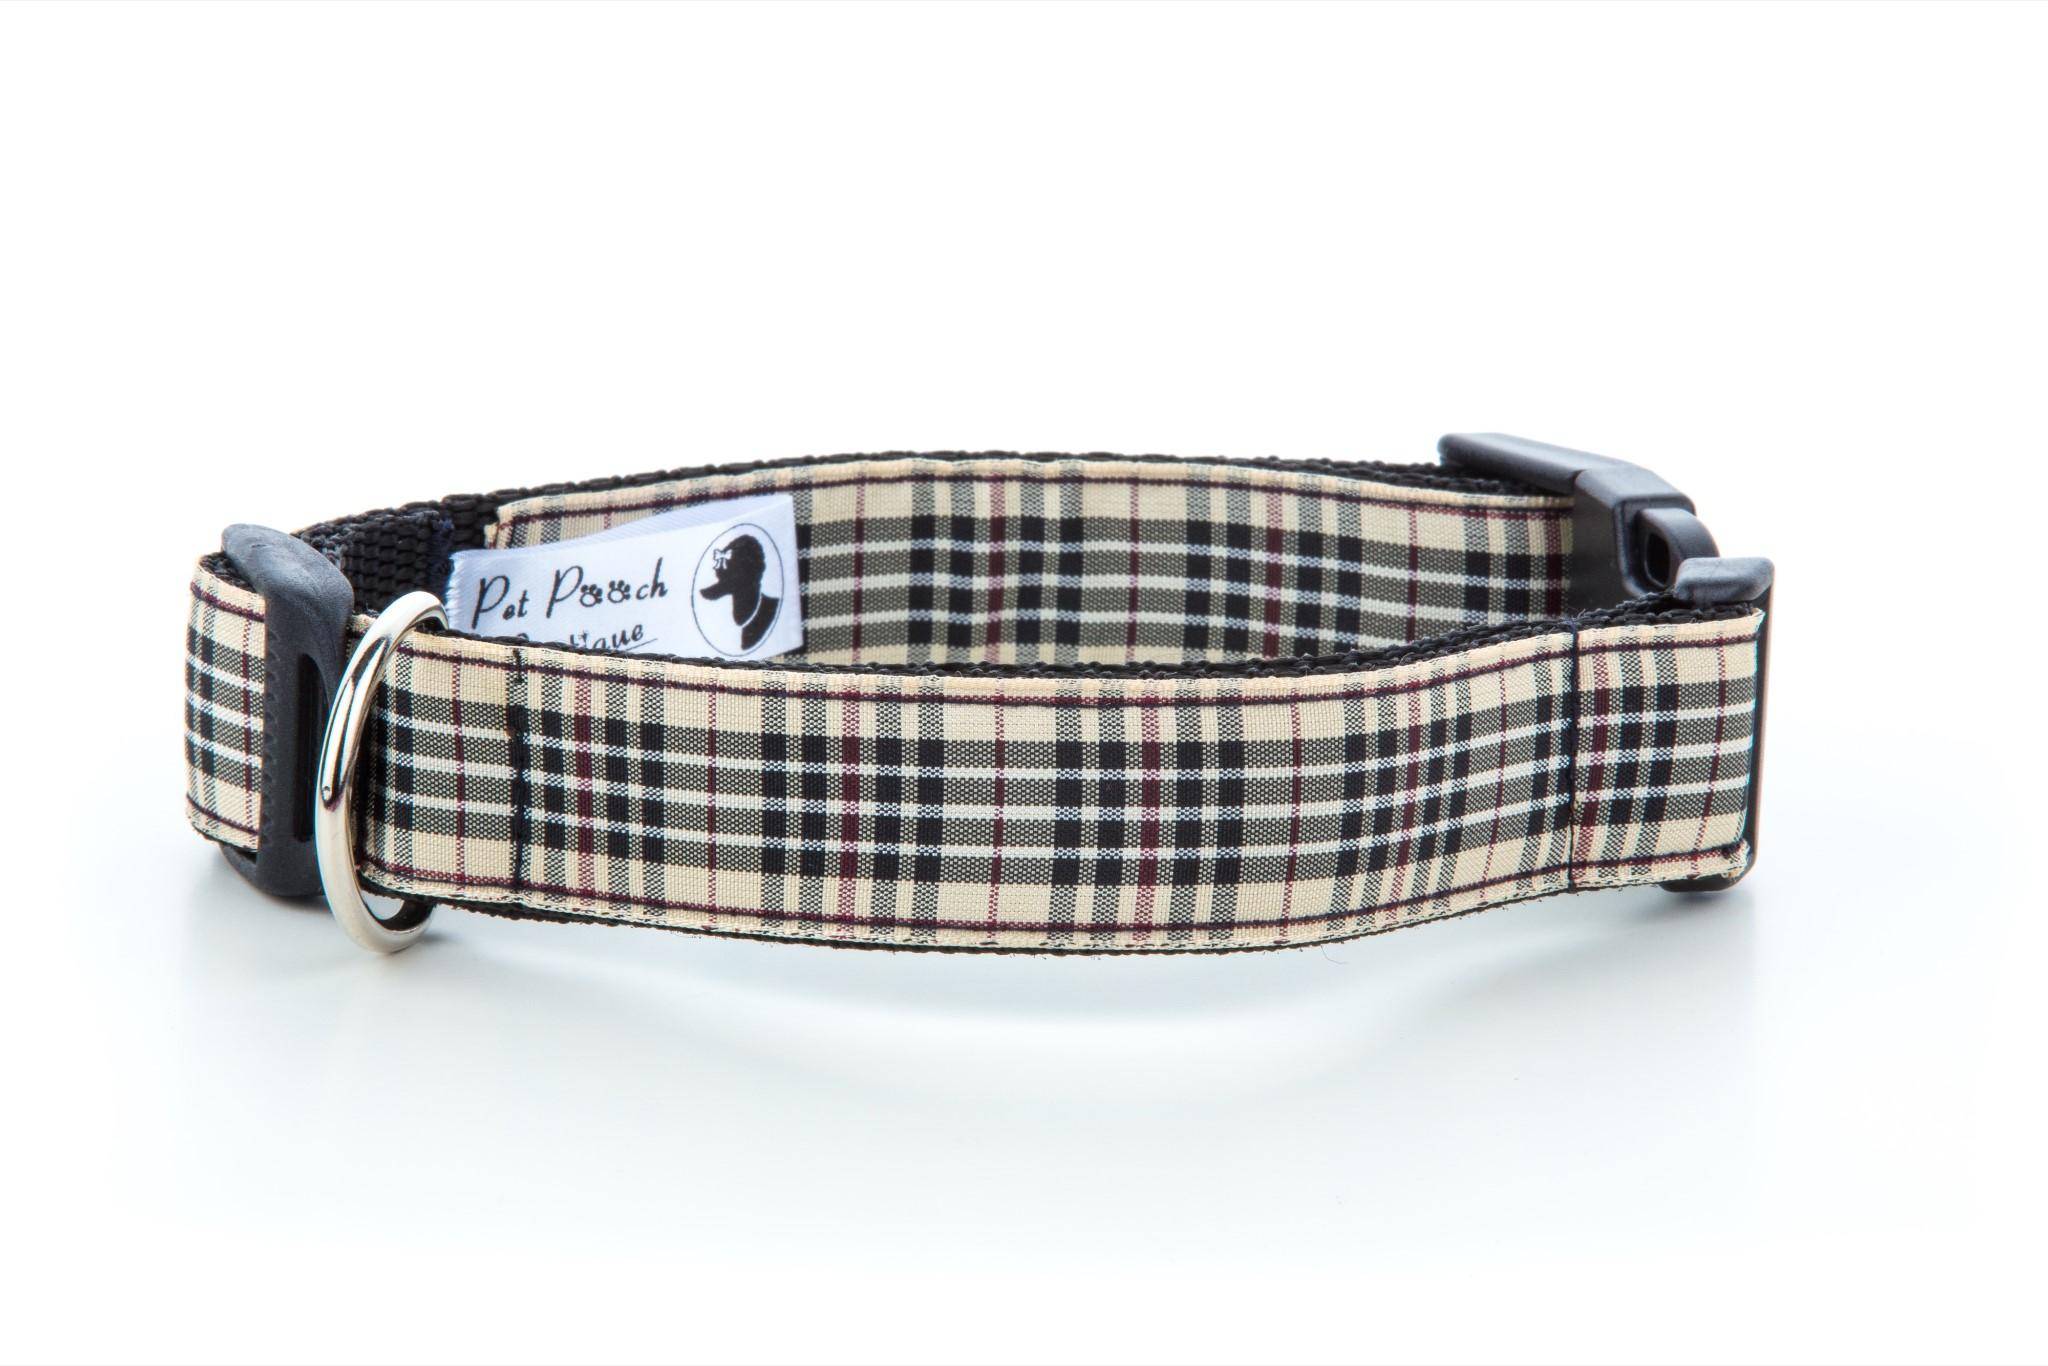 Burberry Dog Collars For Sale